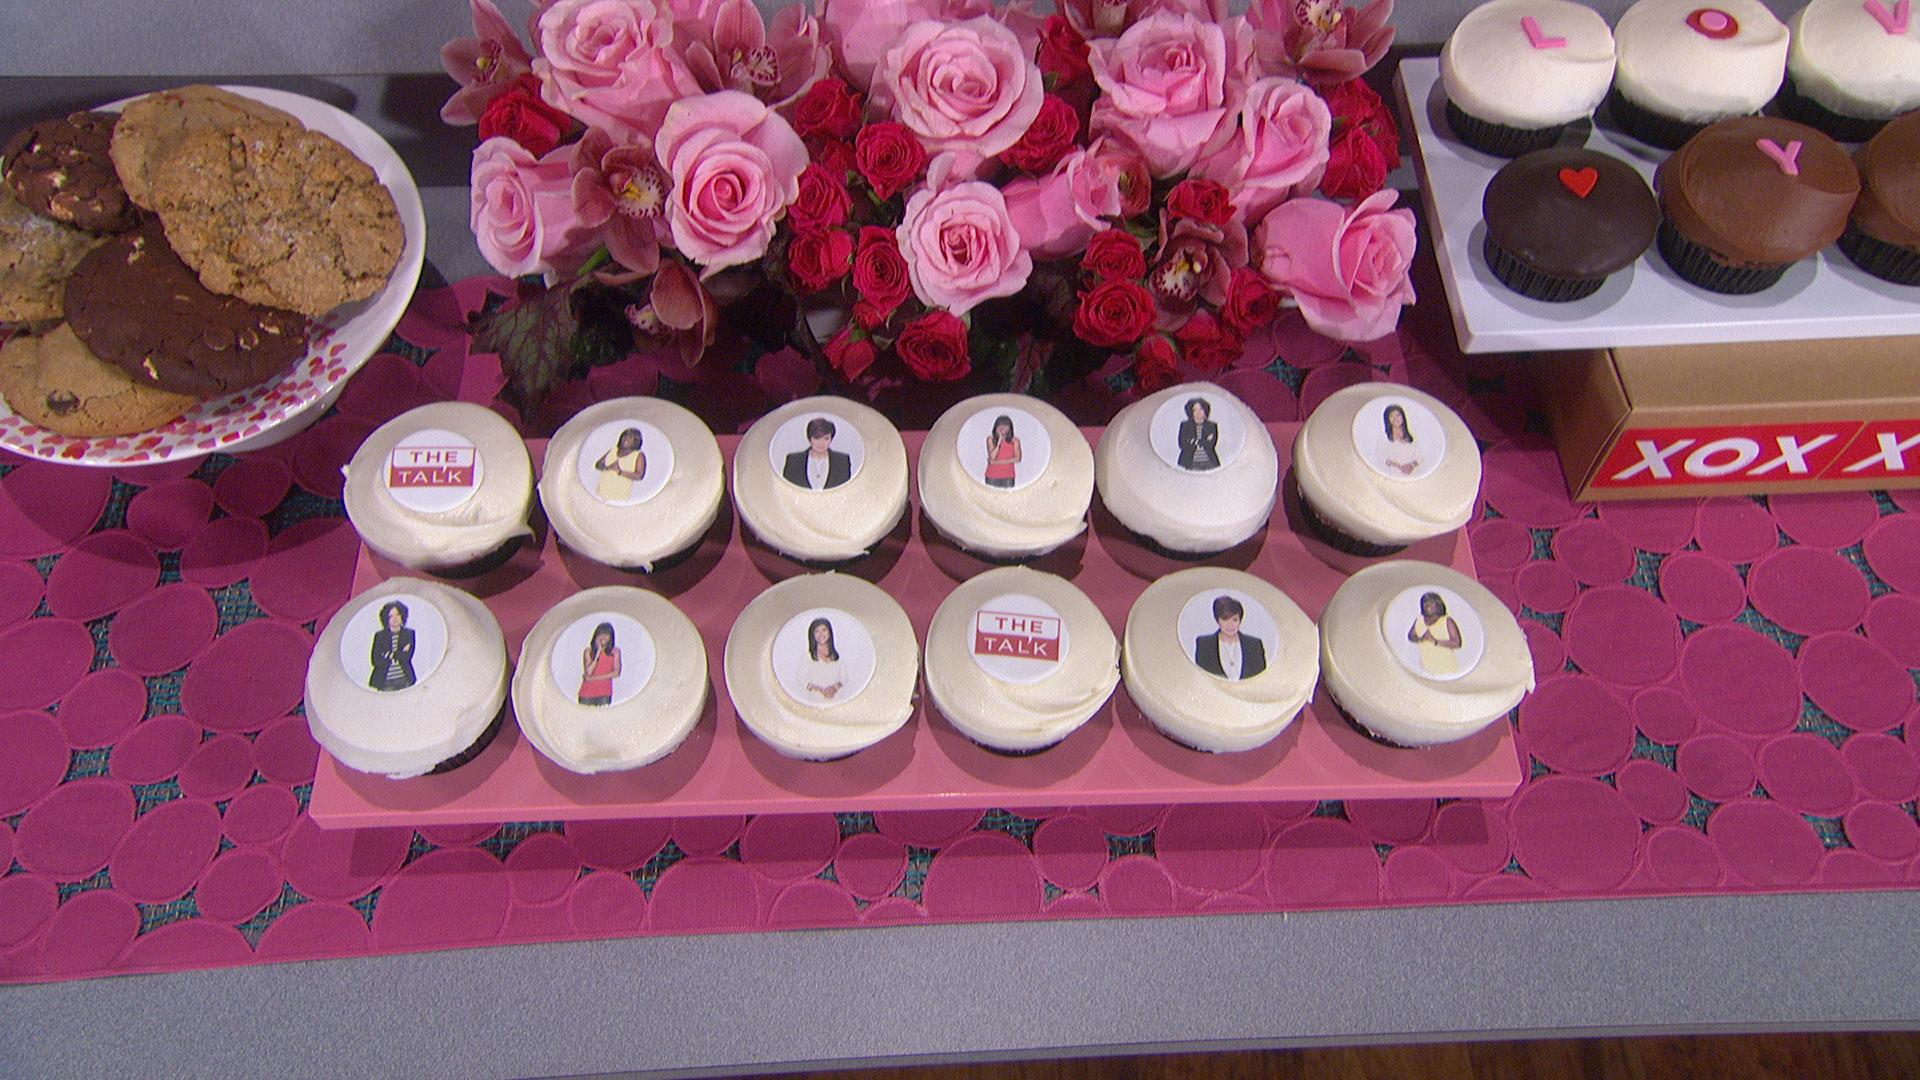 10. Cupcakes!